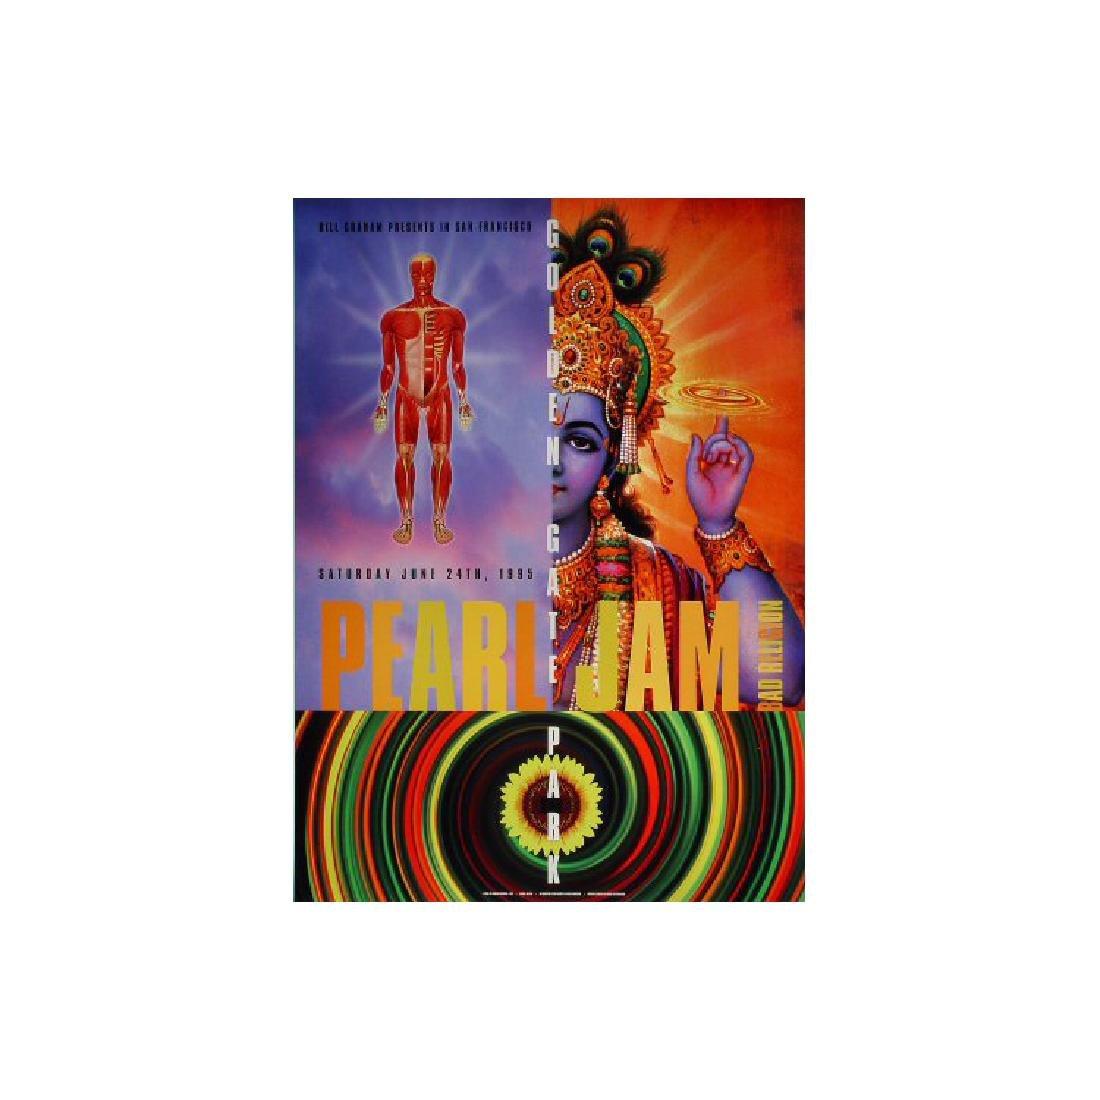 Pearl Jam - 1995 Concert Poster